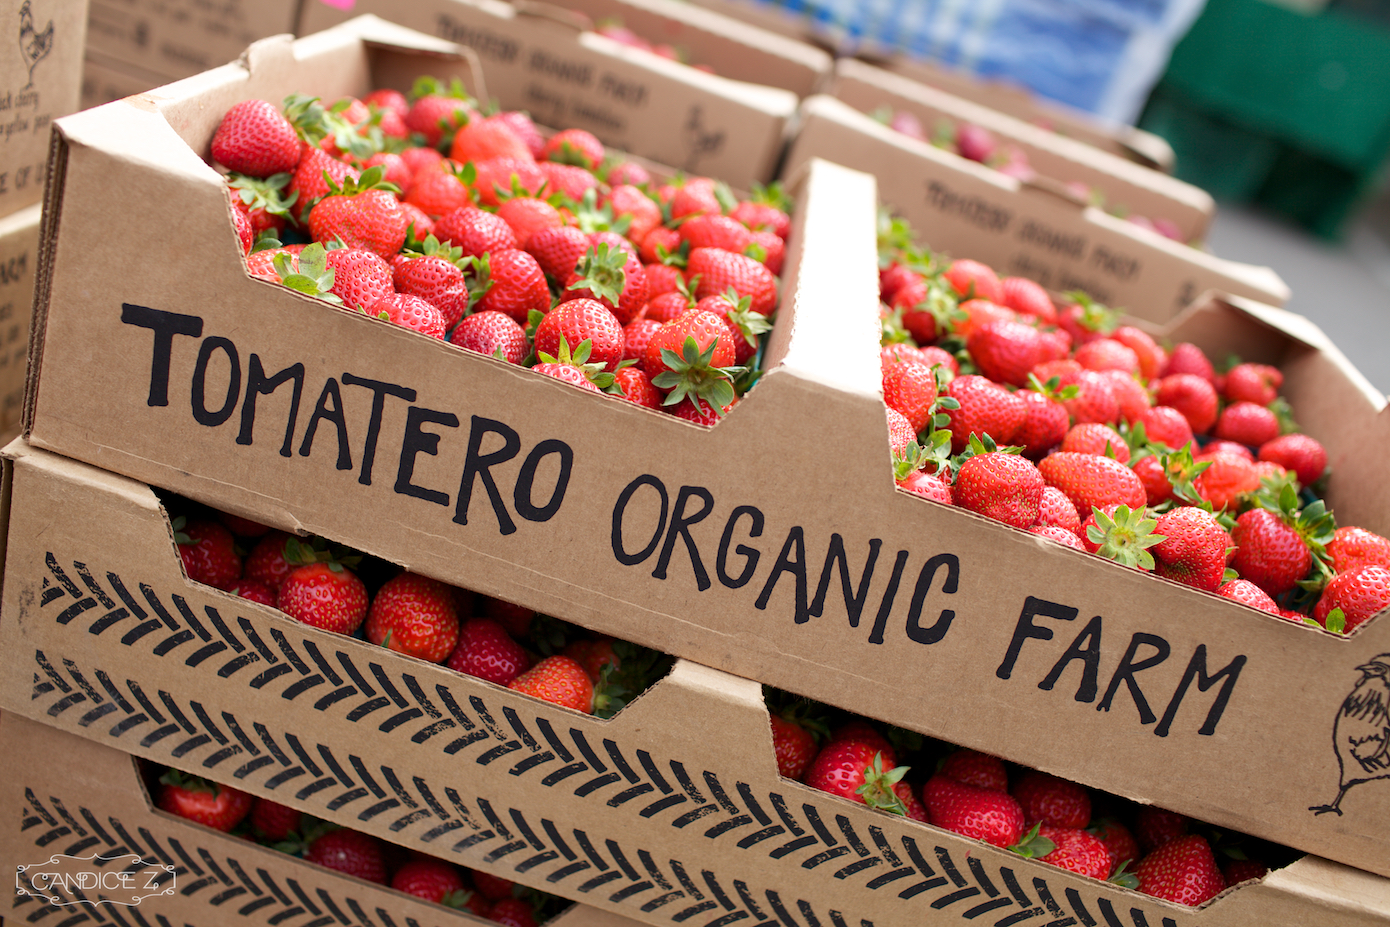 Tomatero Organic Farm.jpg